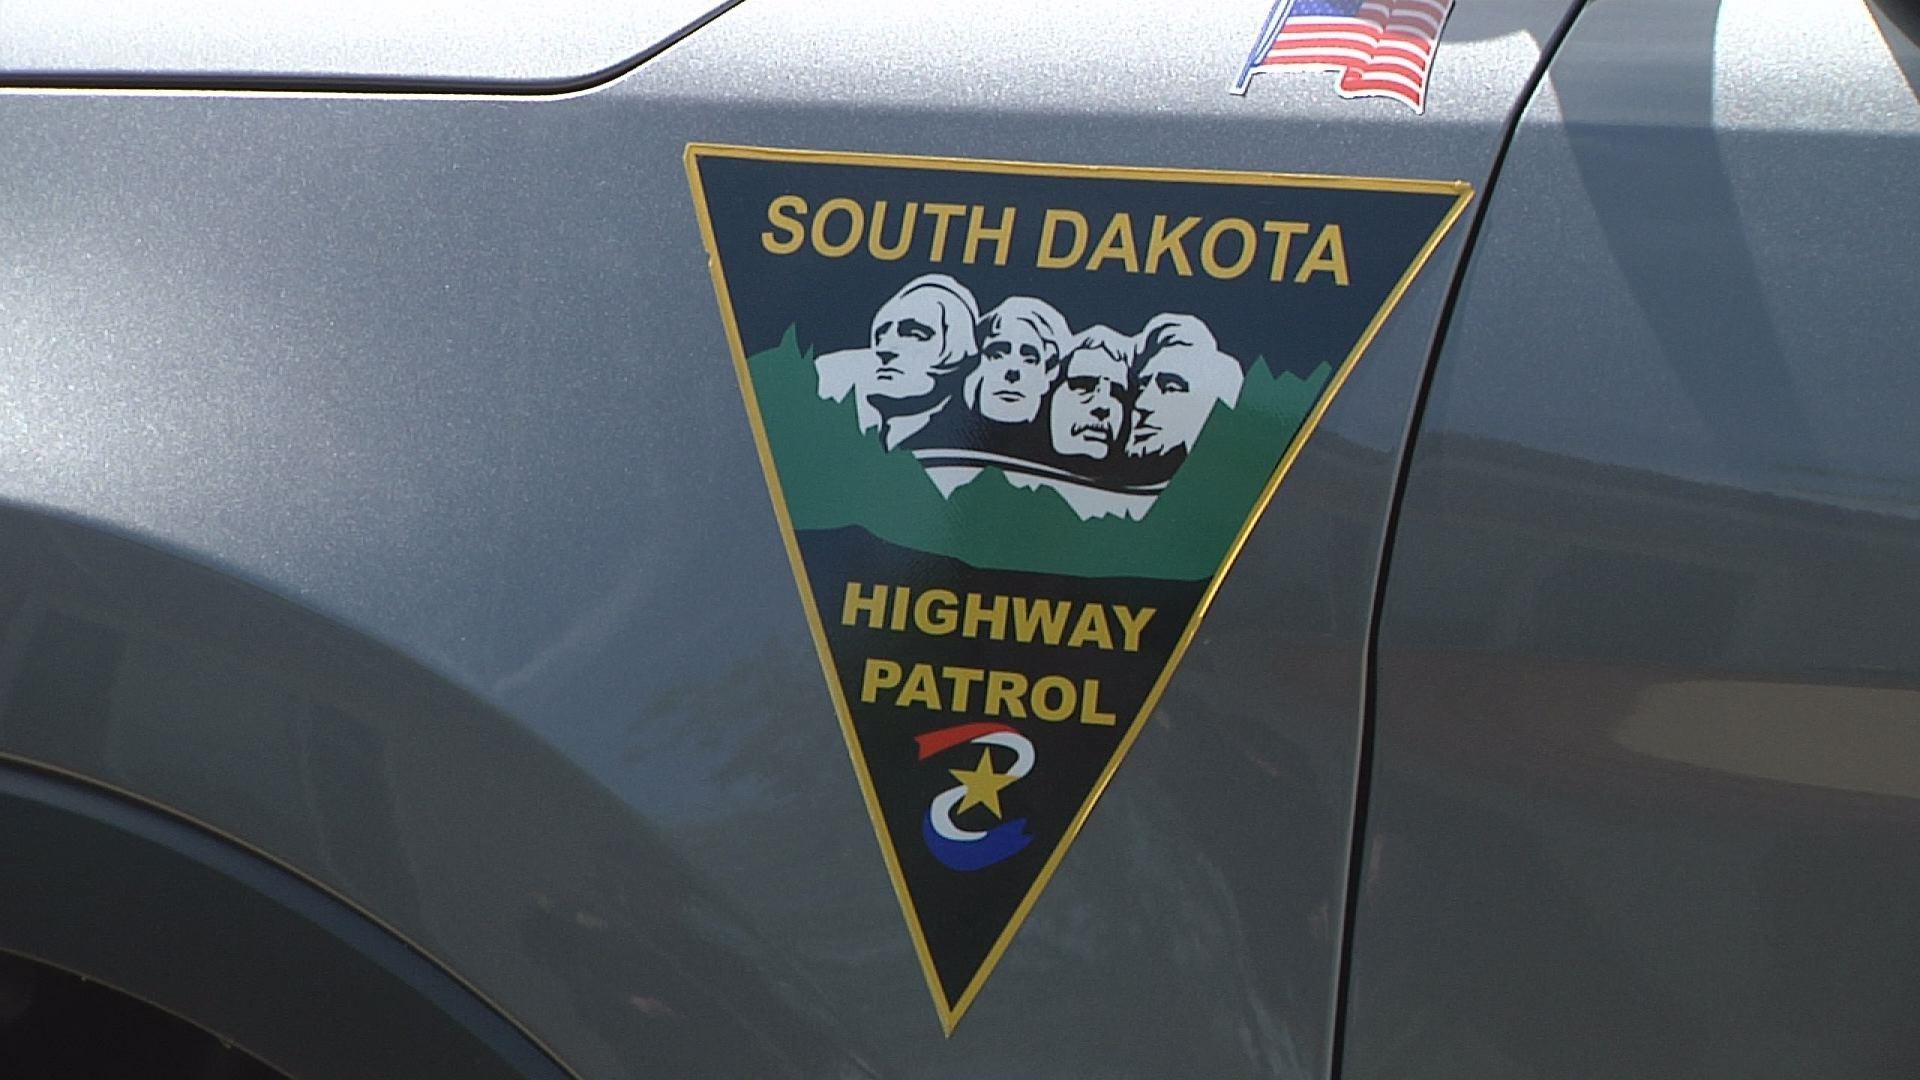 South dakota spink county doland - South Dakota Spink County Doland 5